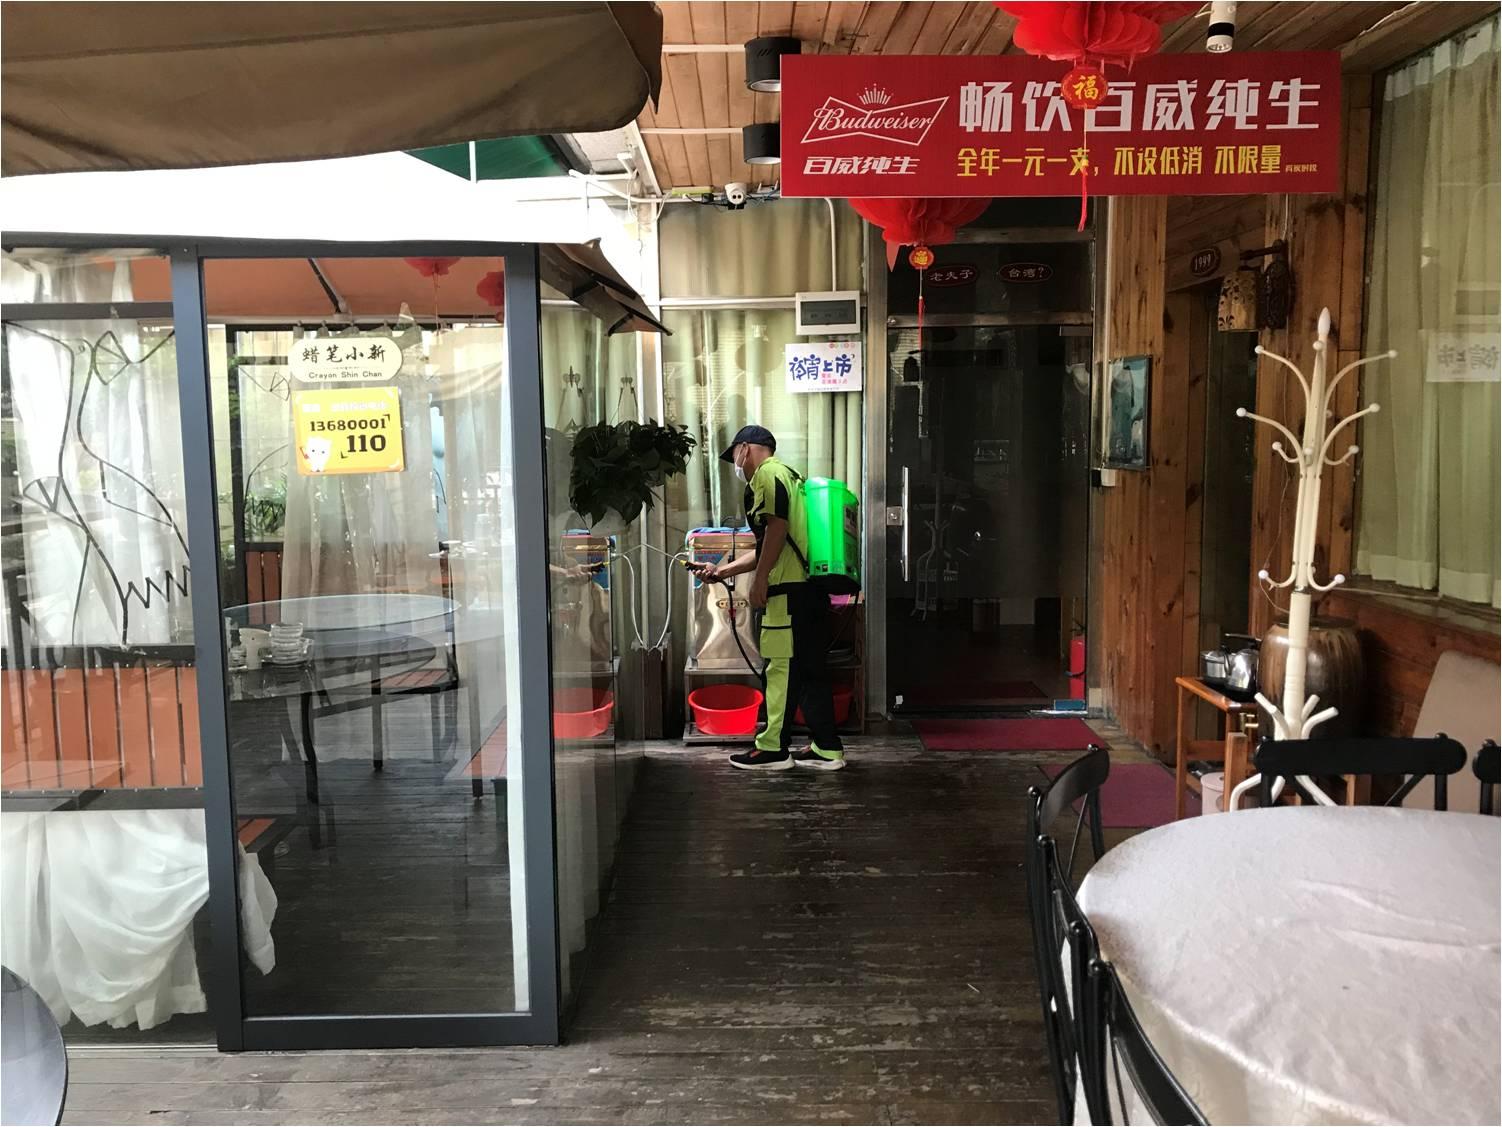 title='清远市饭店'